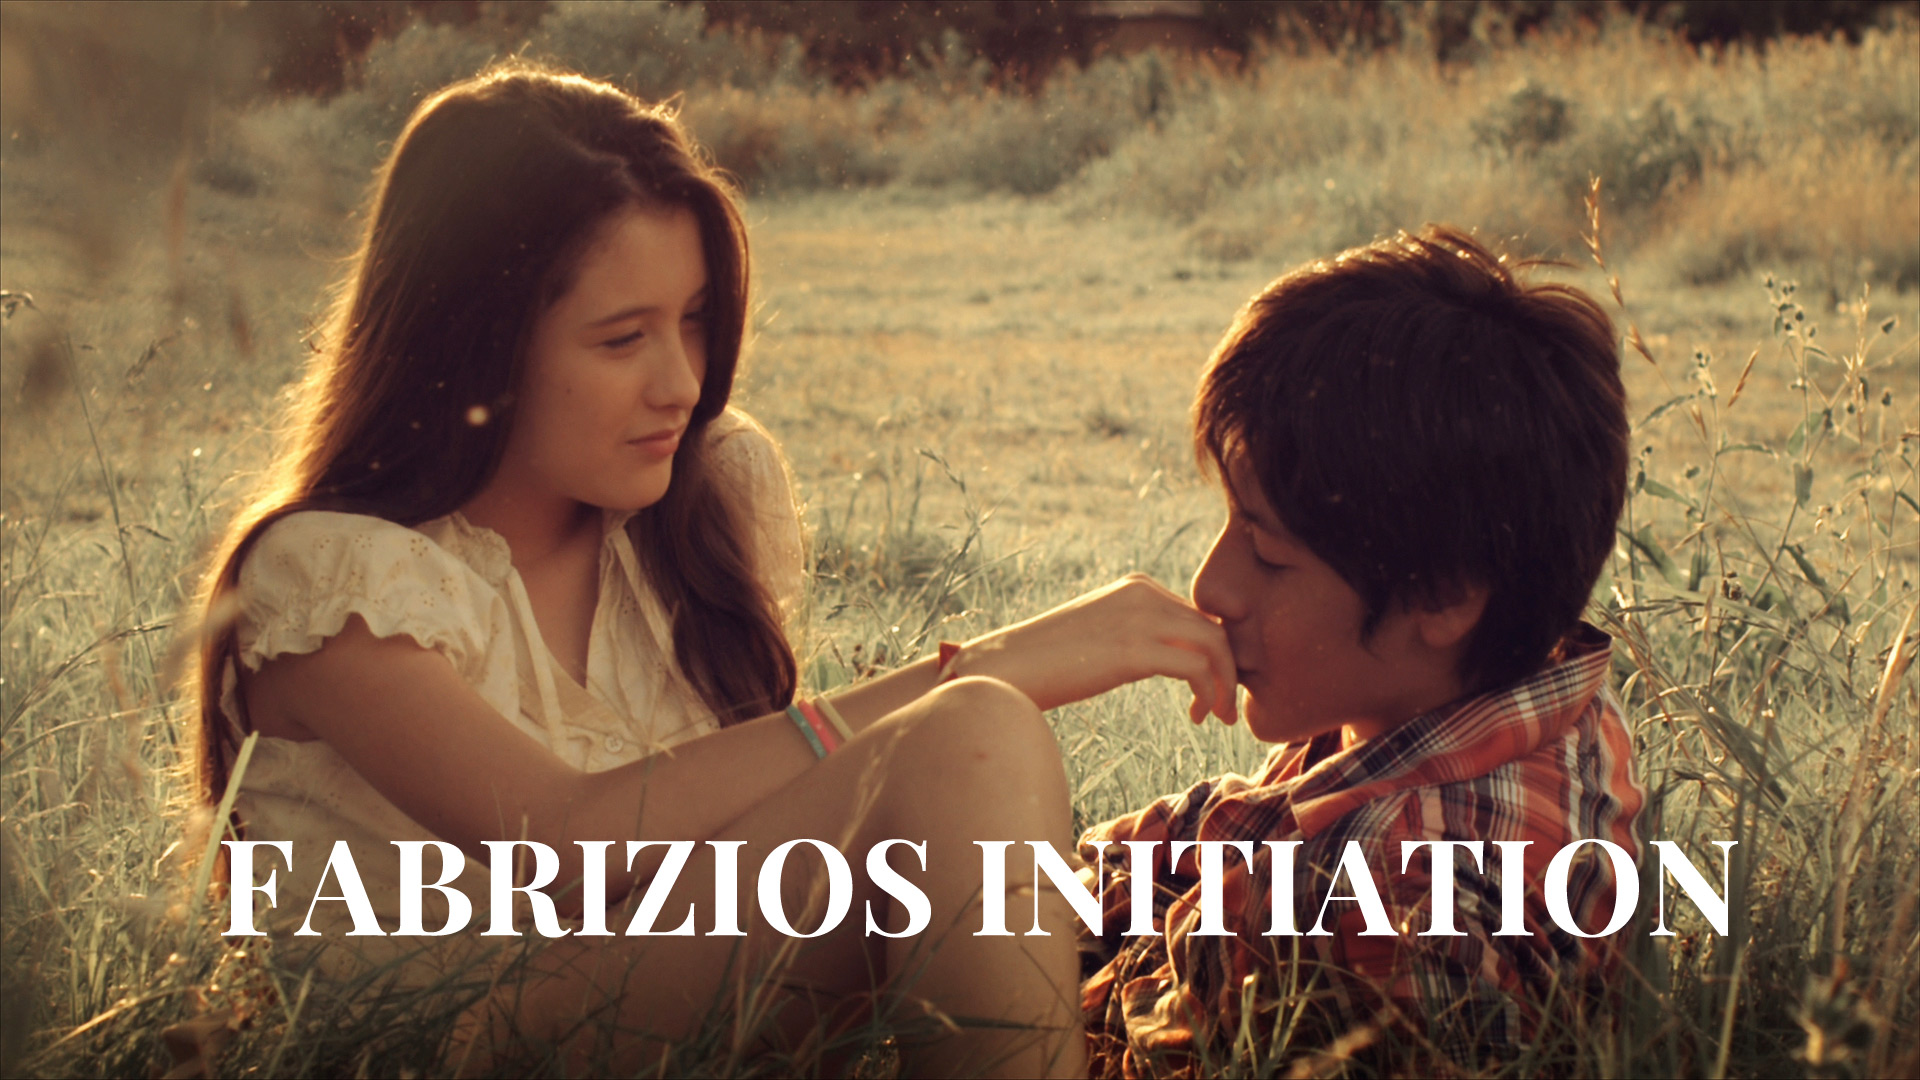 Fabrizio's Initiation